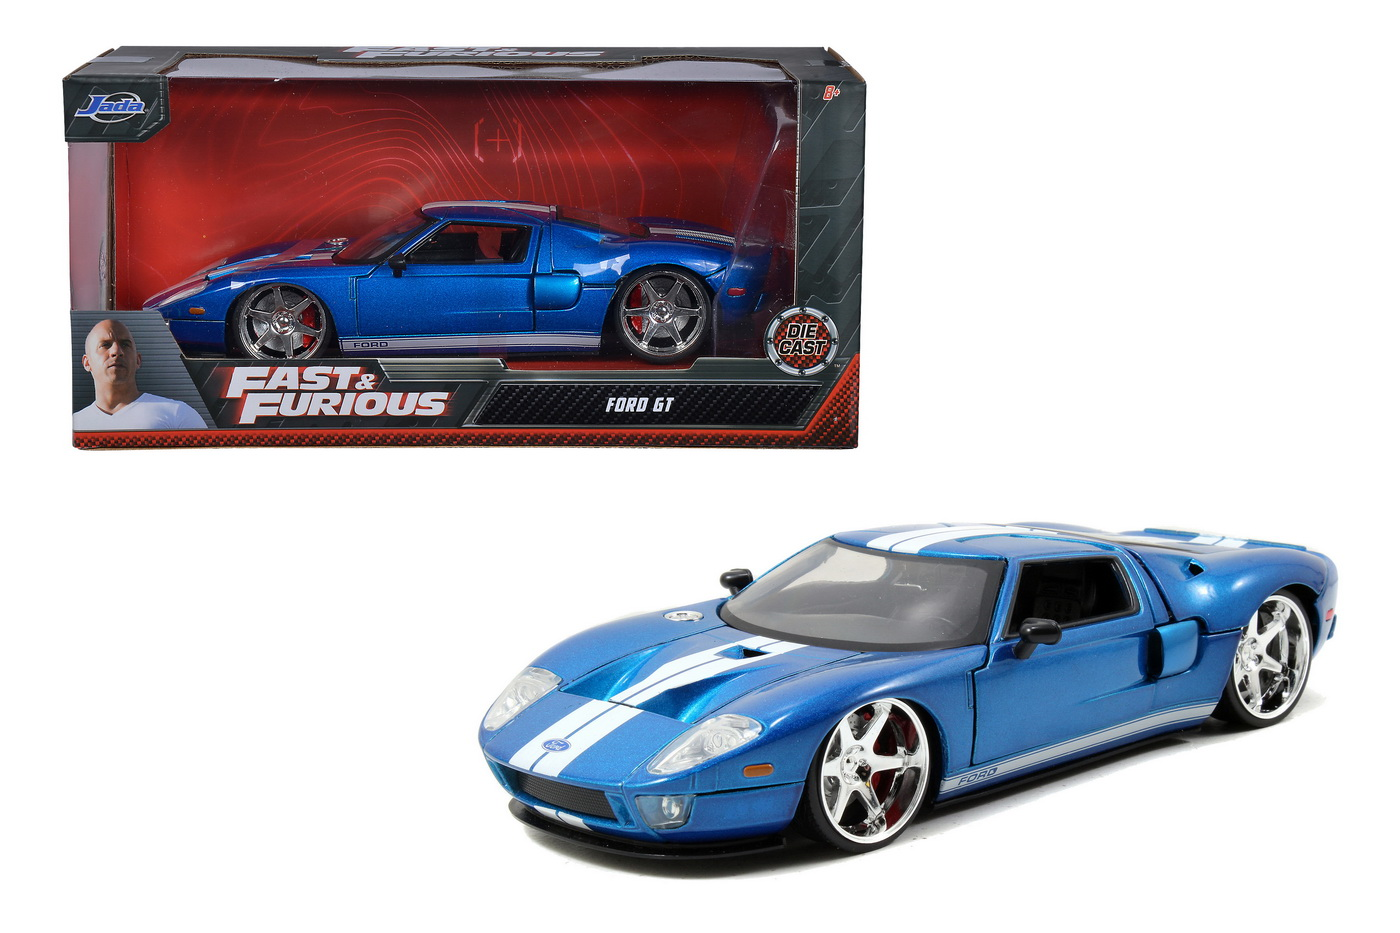 Masinuta Fast And Furious 2005 Ford Gt Scara 1:24